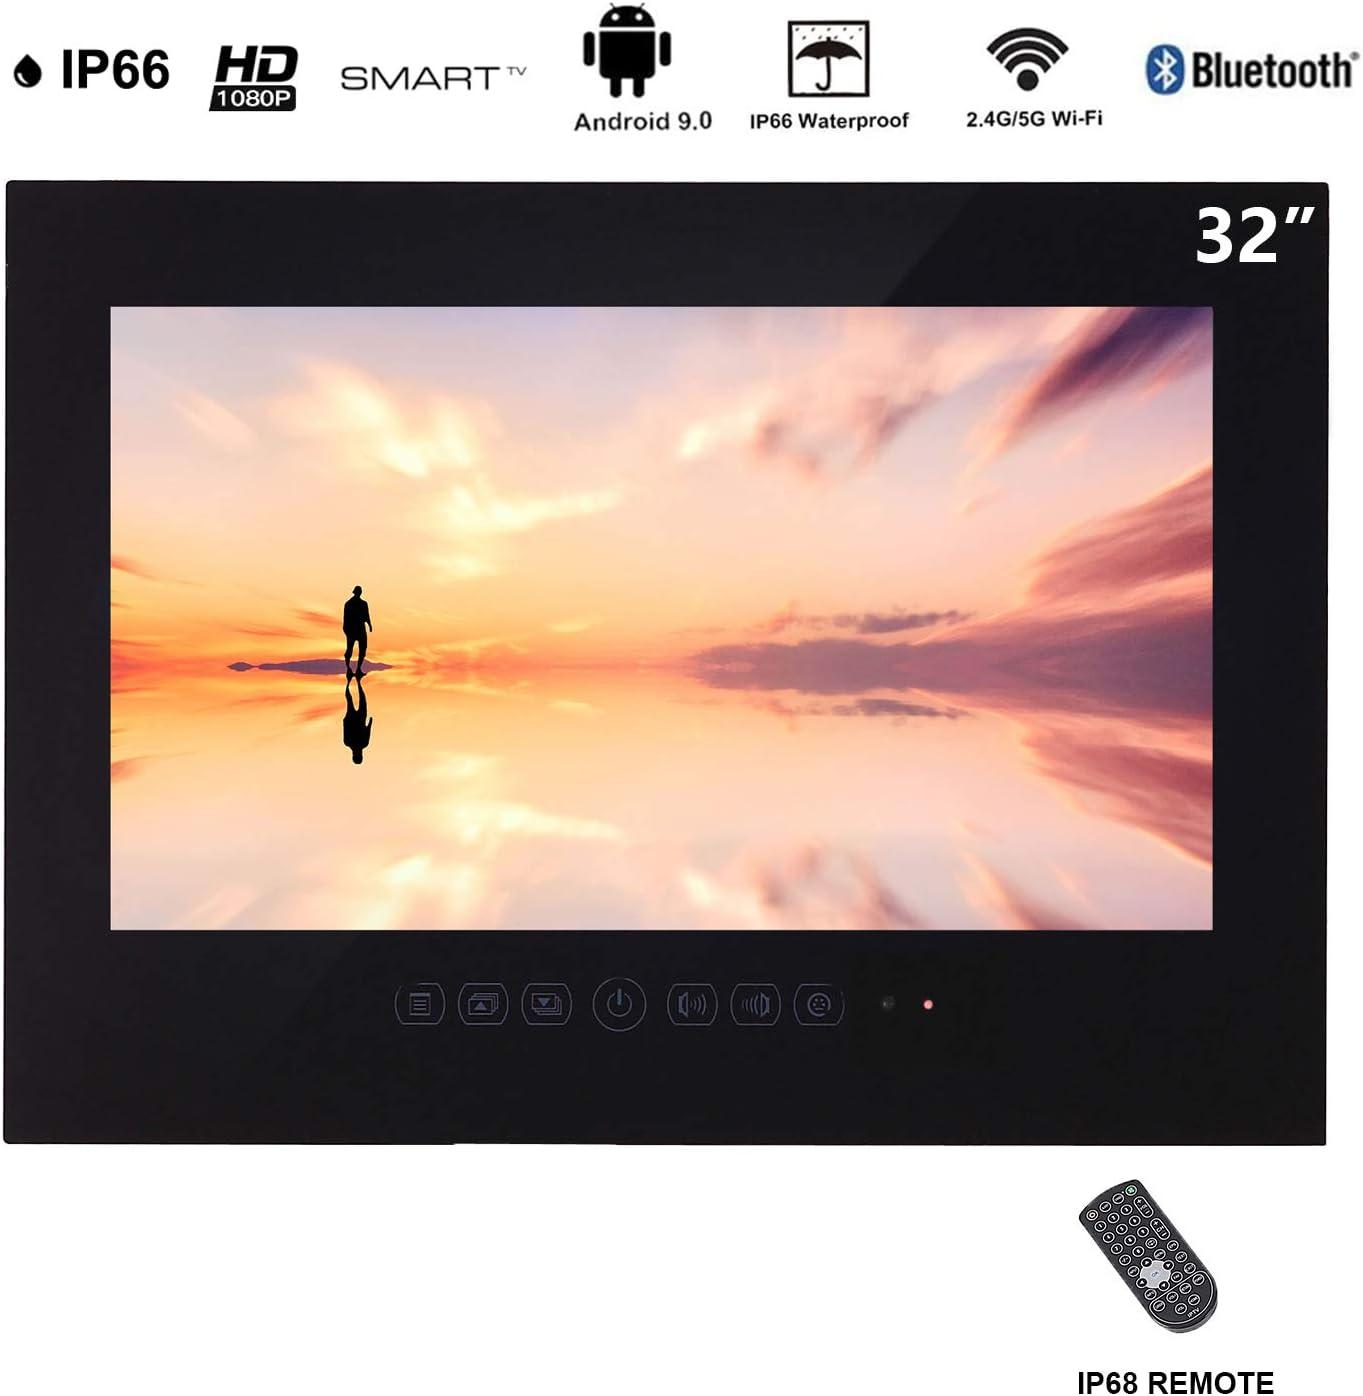 Haocrown Smart TV LED para baño IP66 Sistema Android a Prueba de Agua Pantalla táctil Televisor con Wi-Fi Incorporado (32 Pulgadas, Negro): Amazon.es: Electrónica